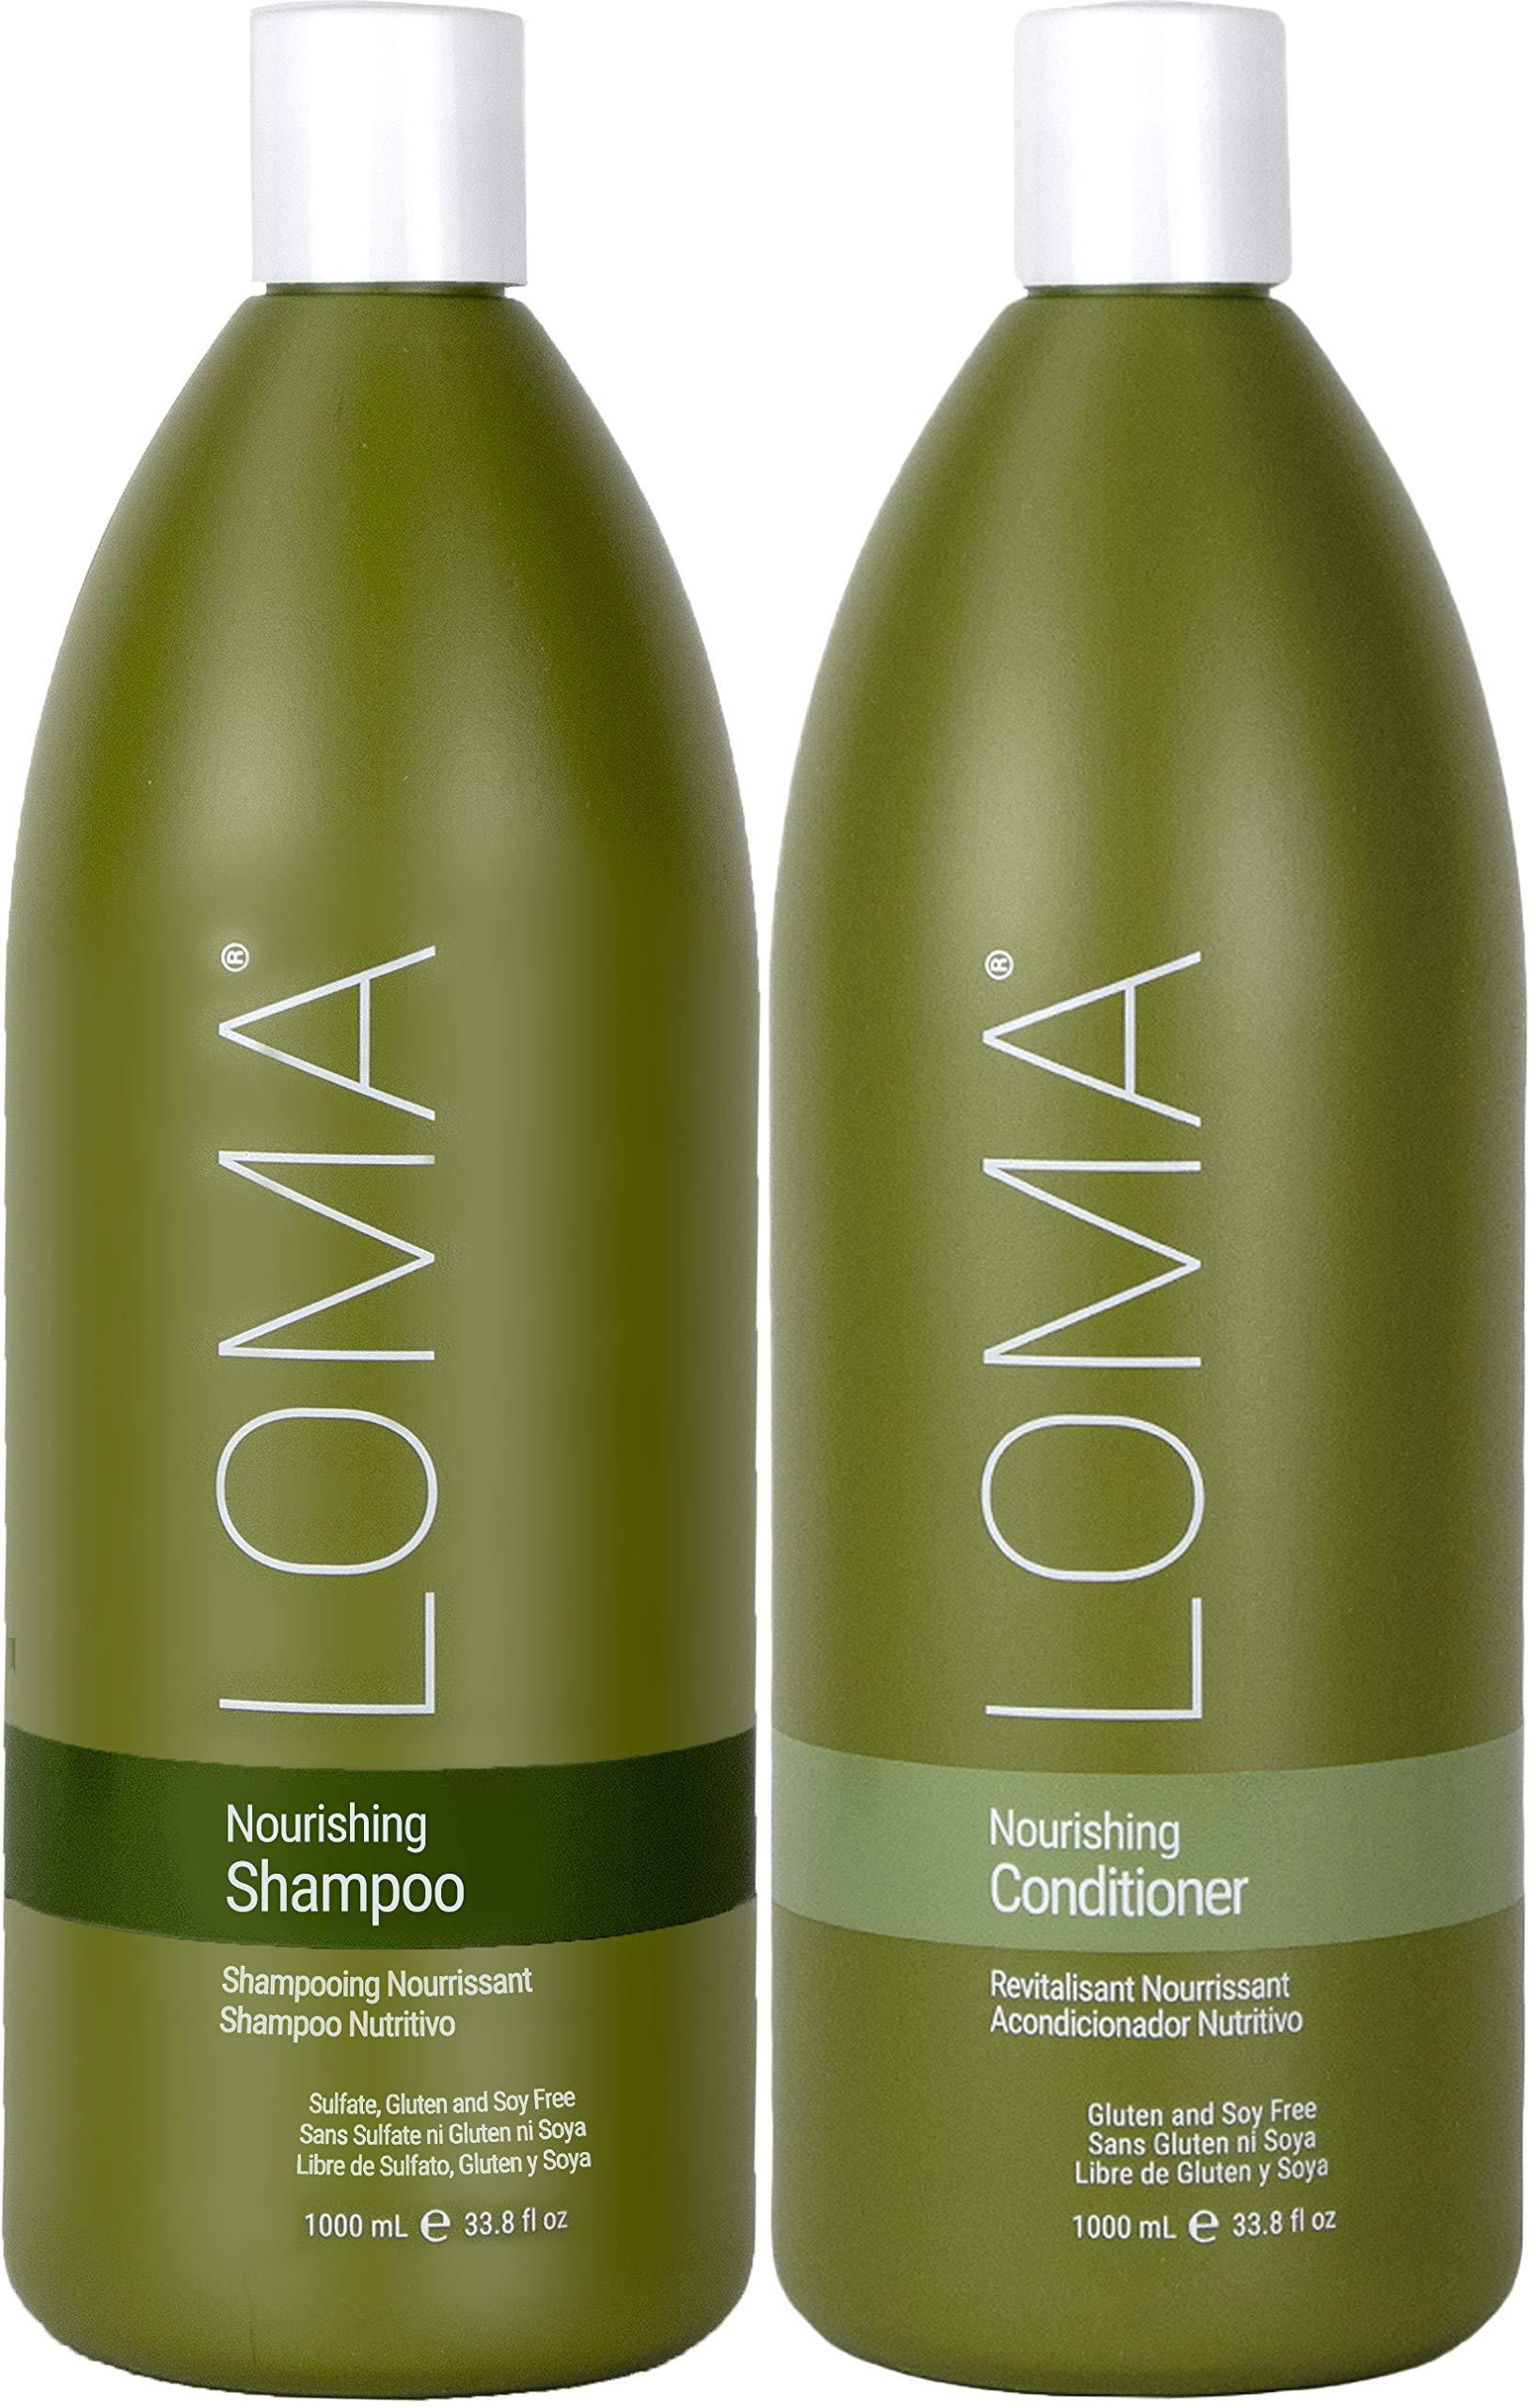 Loma Hair Care Nourishing Shampoo Nourishing Conditioner Duo, 33 oz. by Loma Hair Care